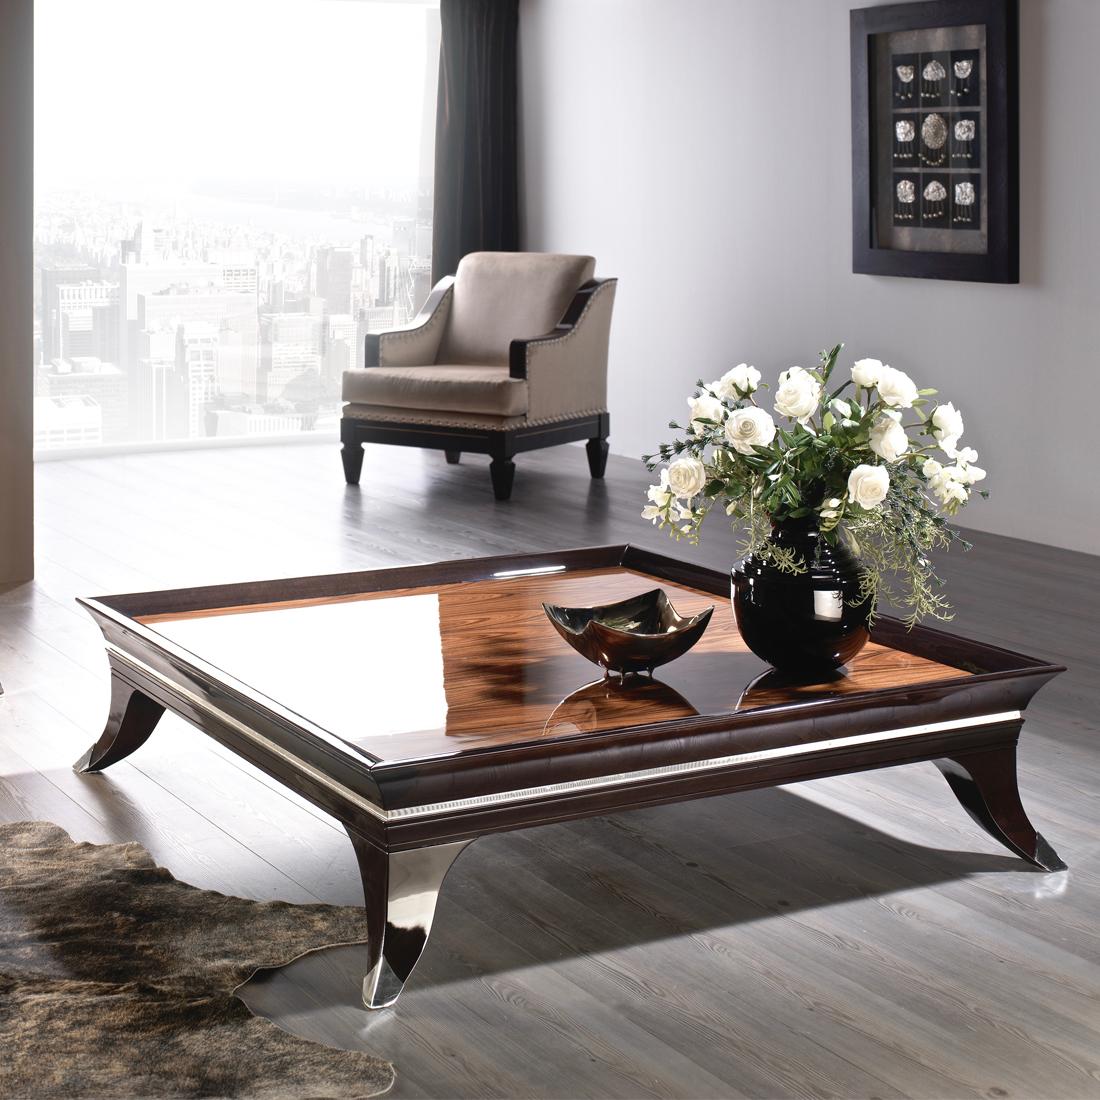 Luxury art deco coffee, luxury art deco furniture